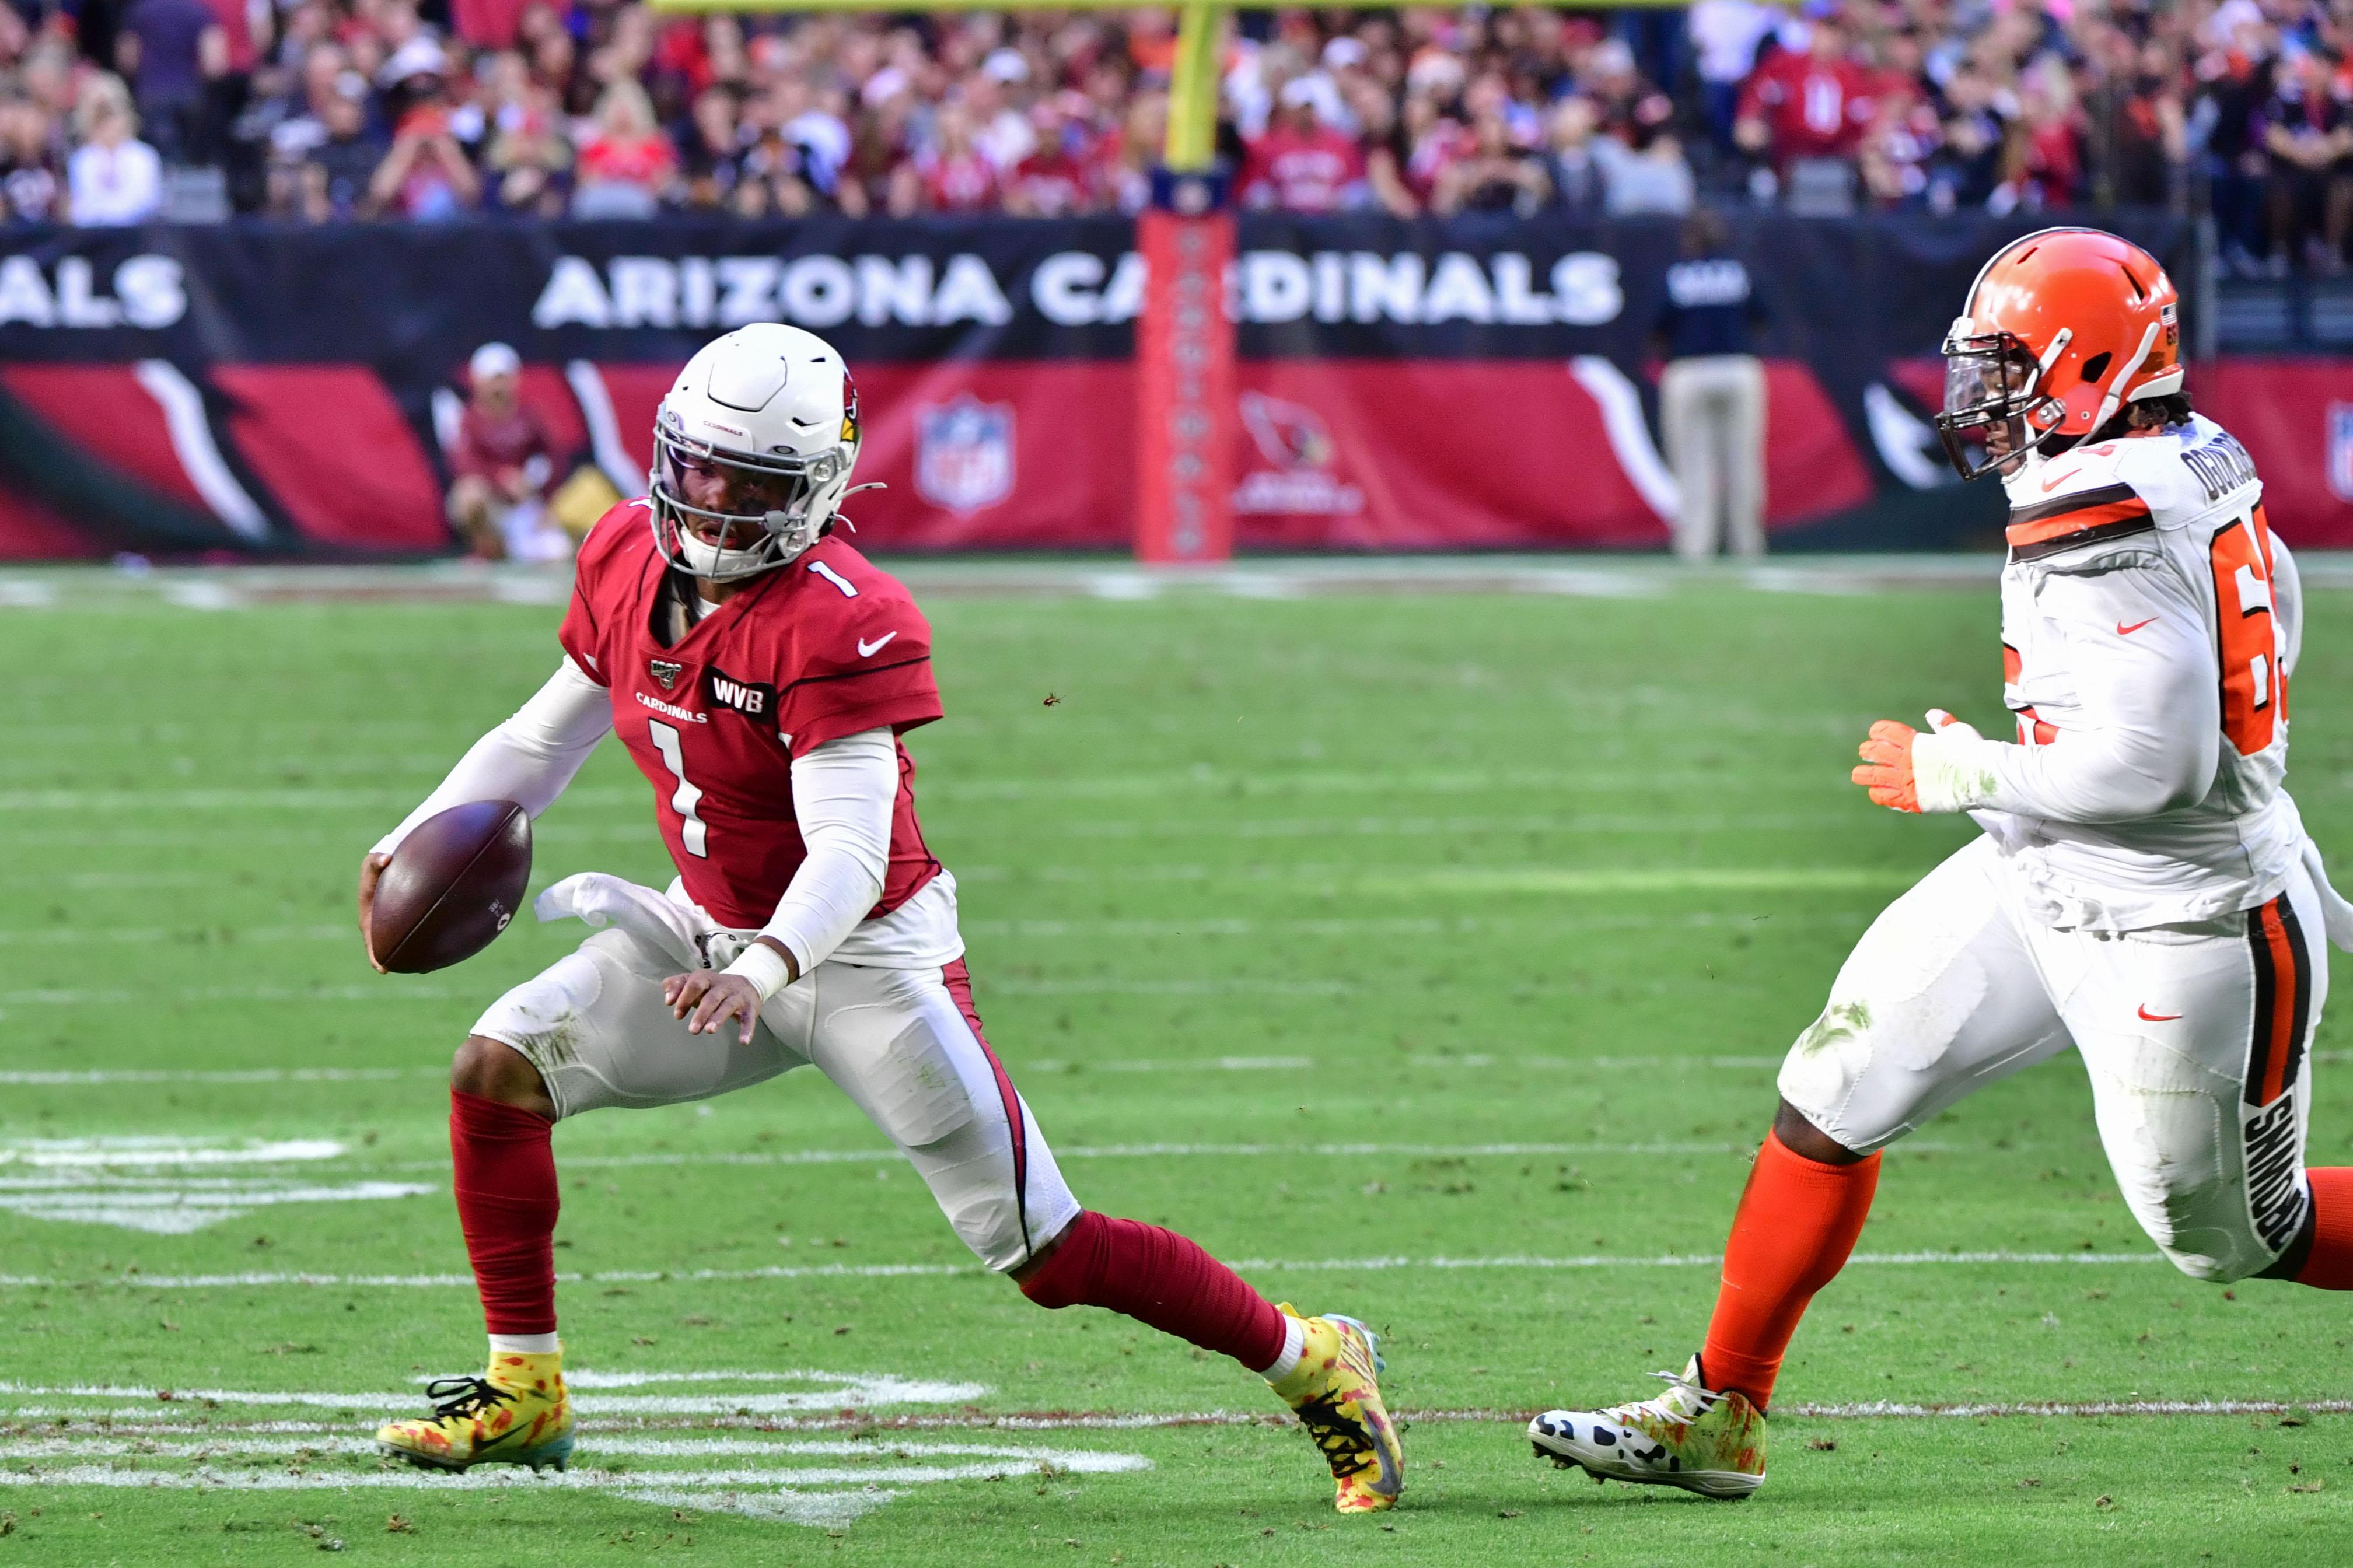 Arizona Cardinals quarterback Kyler Murray runs the ball against Cleveland Browns.